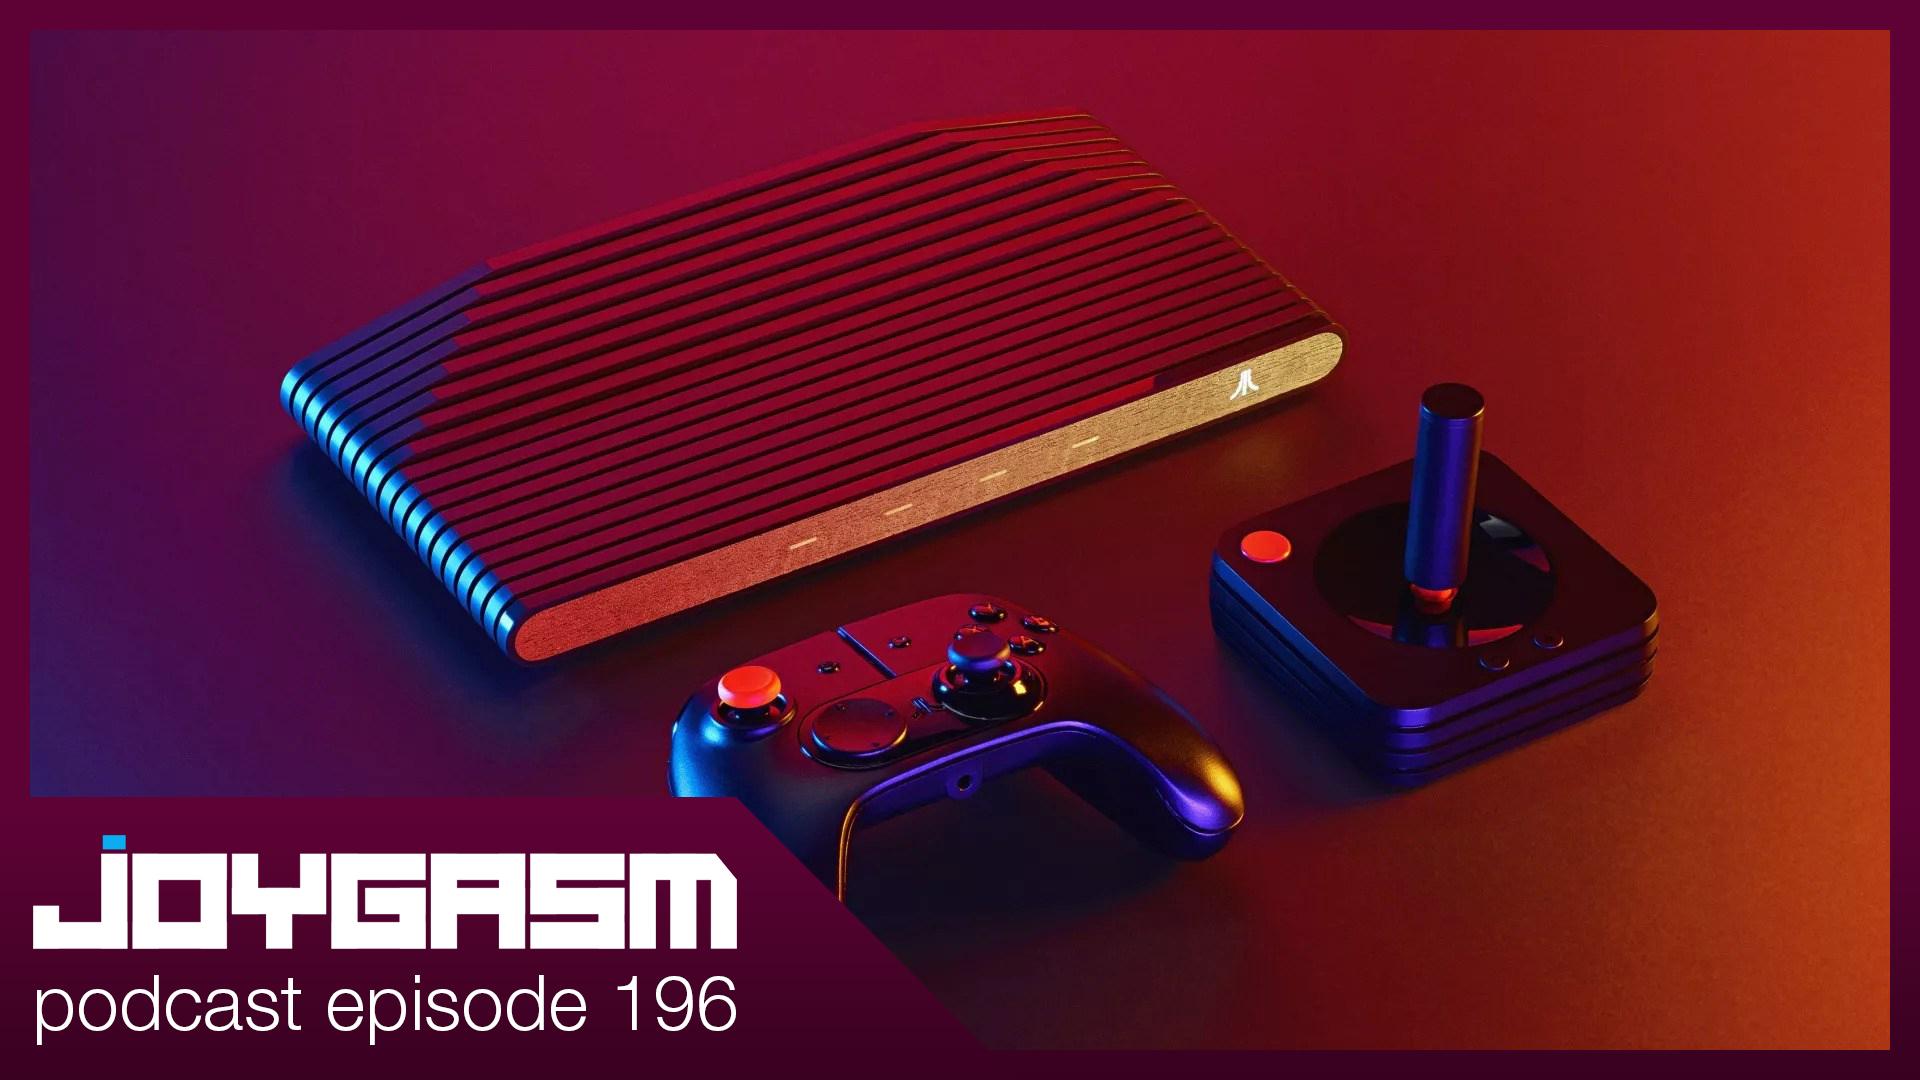 Ep. 196: Atari VCS Console Impressions